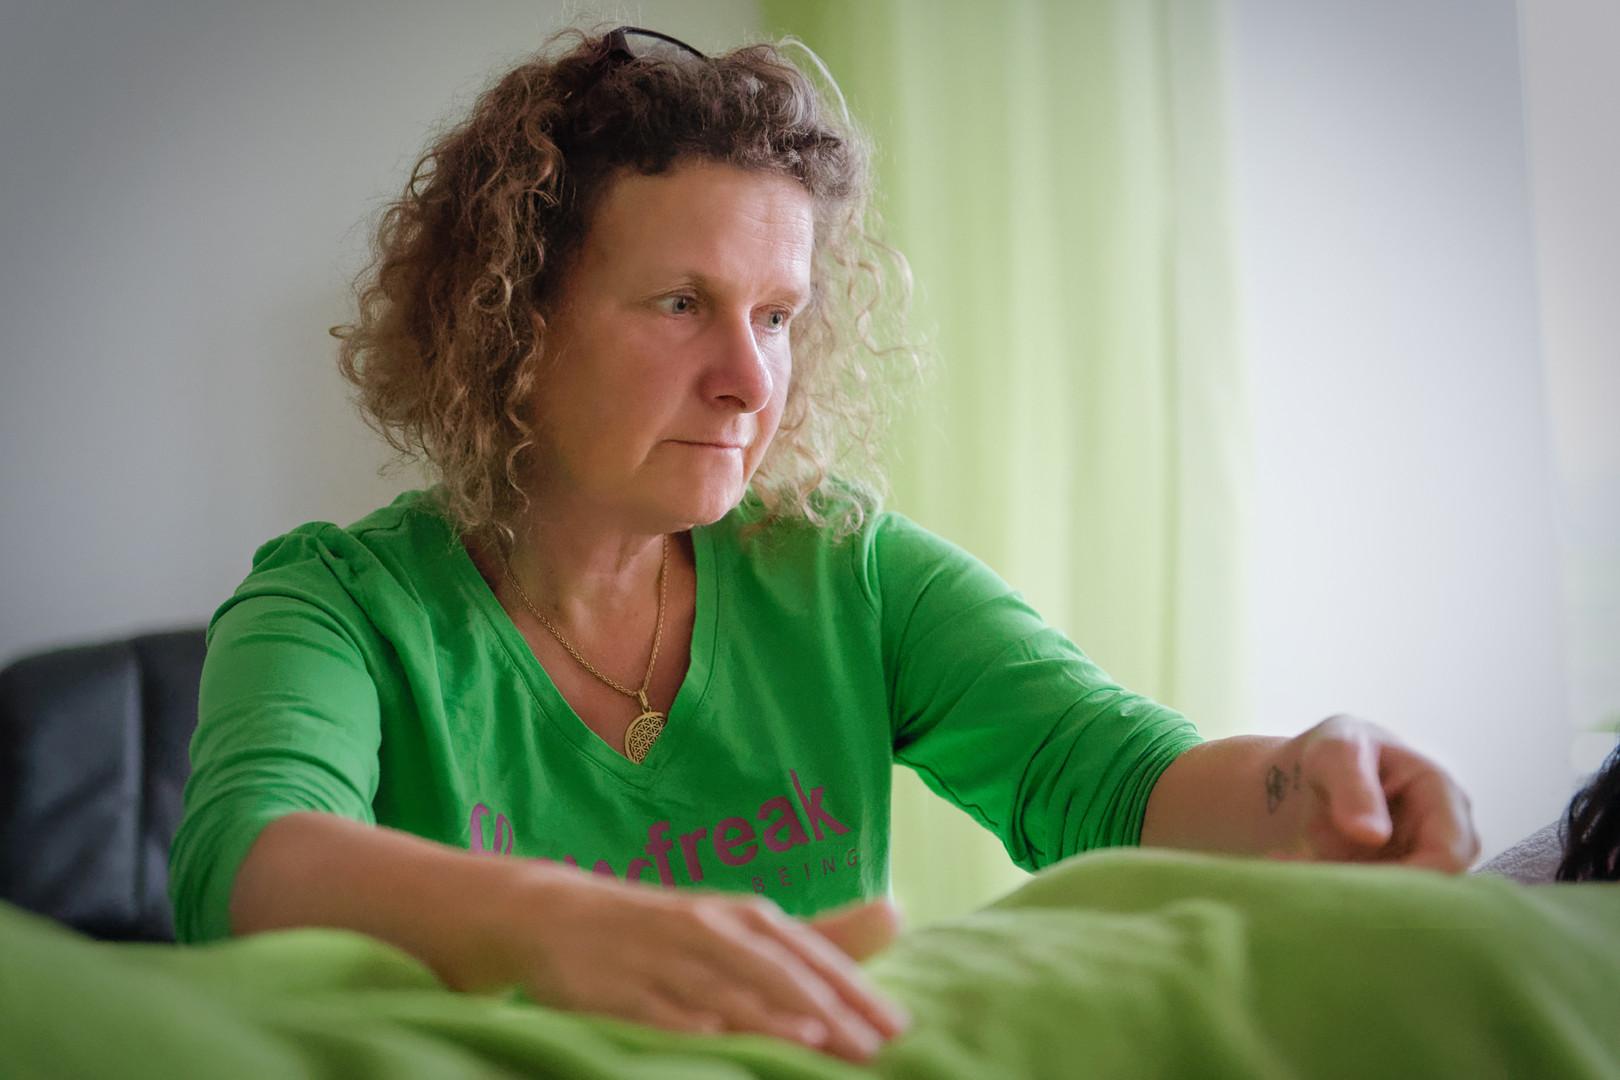 Barbara Schubiger